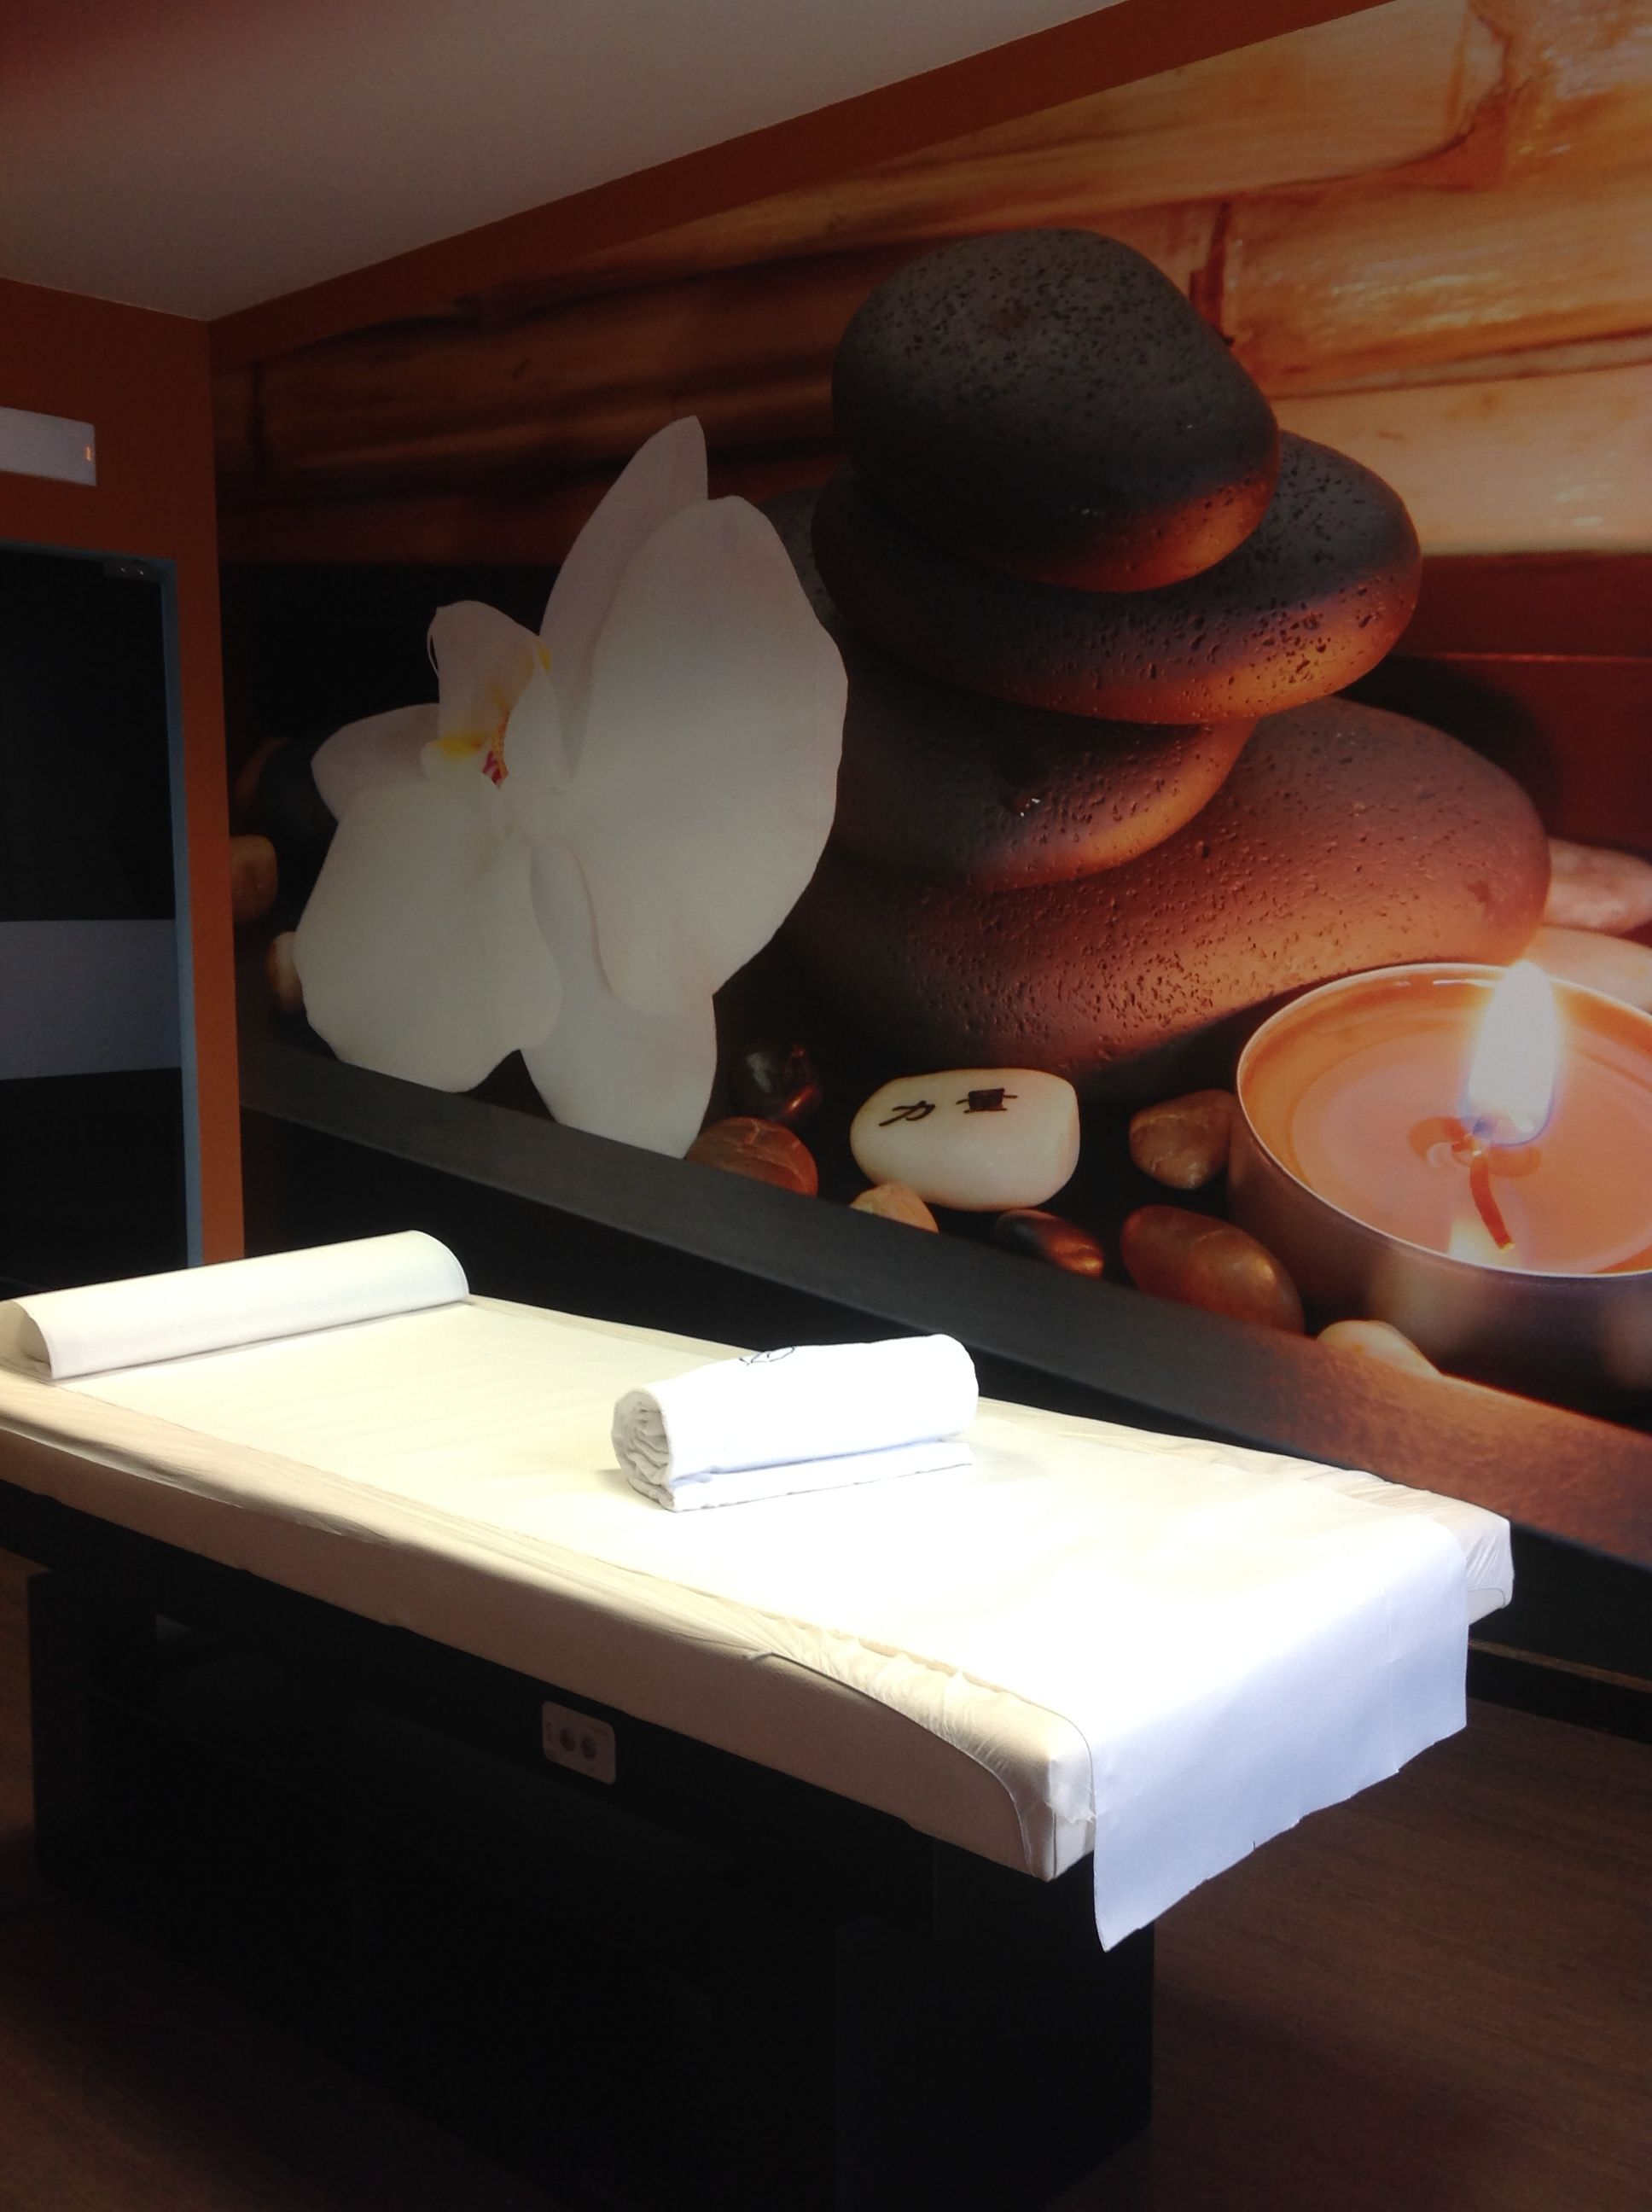 Sala de masajes palaciodeluces relaischateaux zona - Iluminacion para cuadros ...